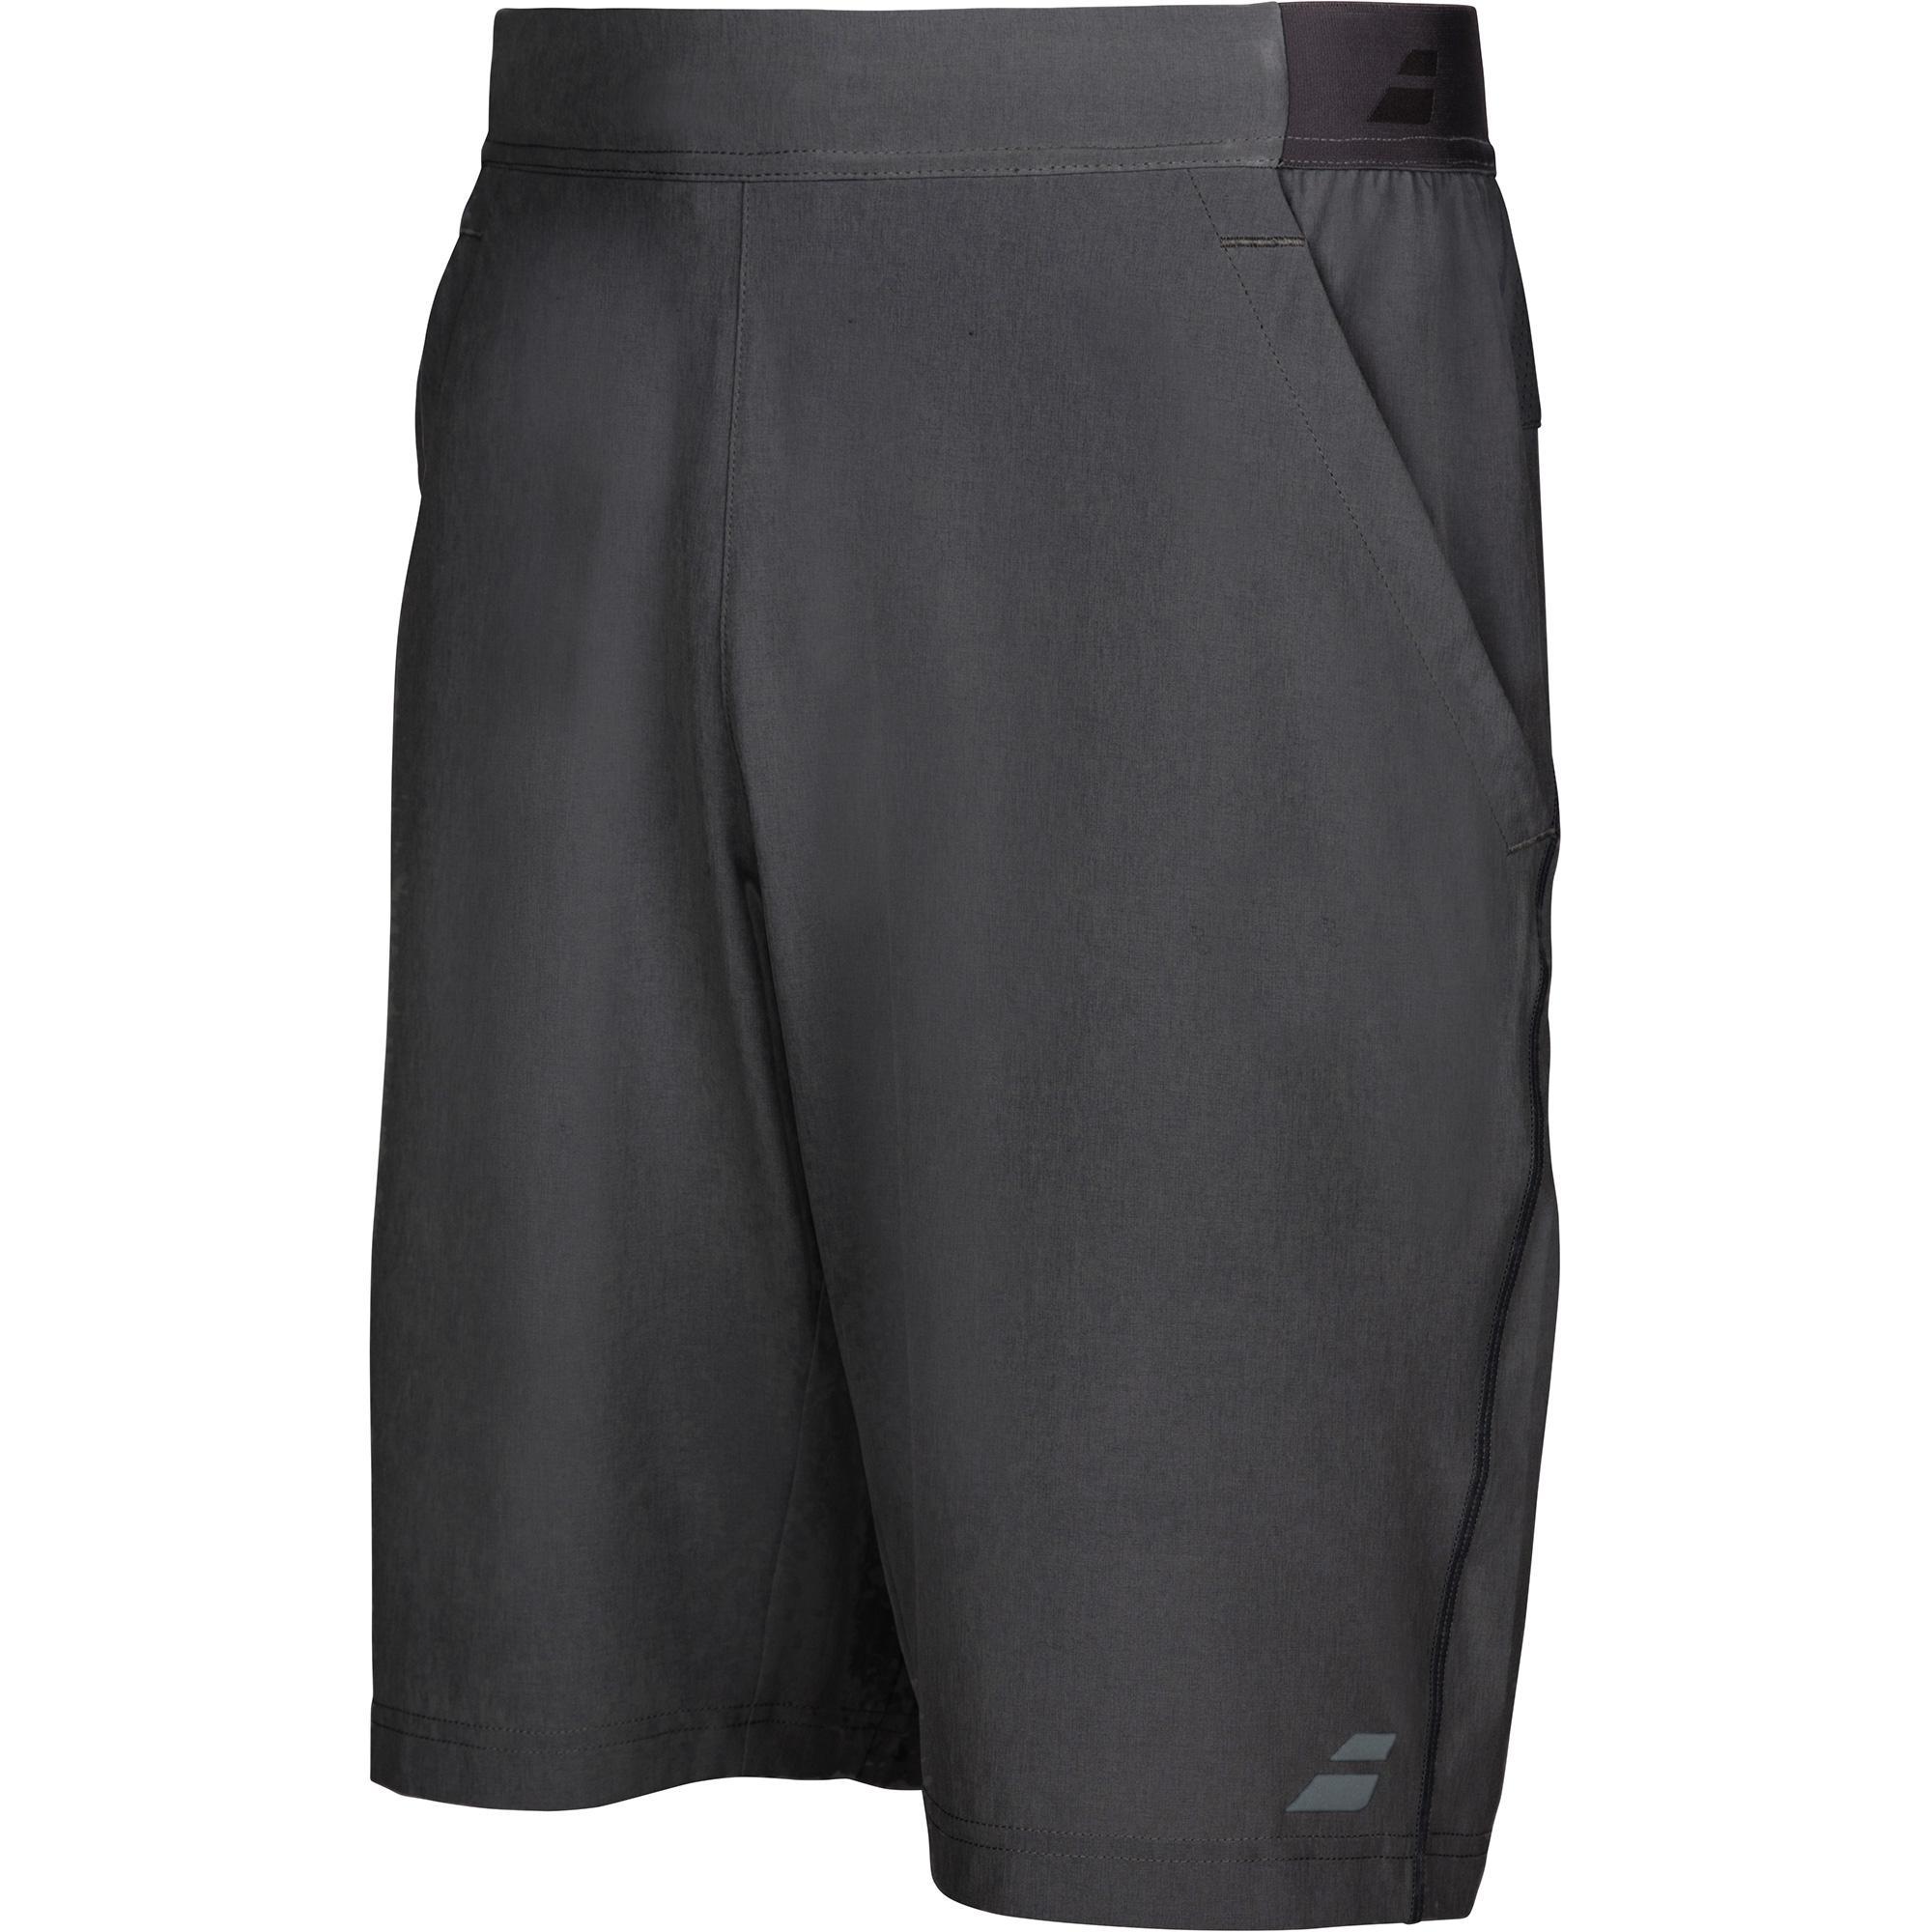 Babolat Unisex Kids Play Short Boy Shorts